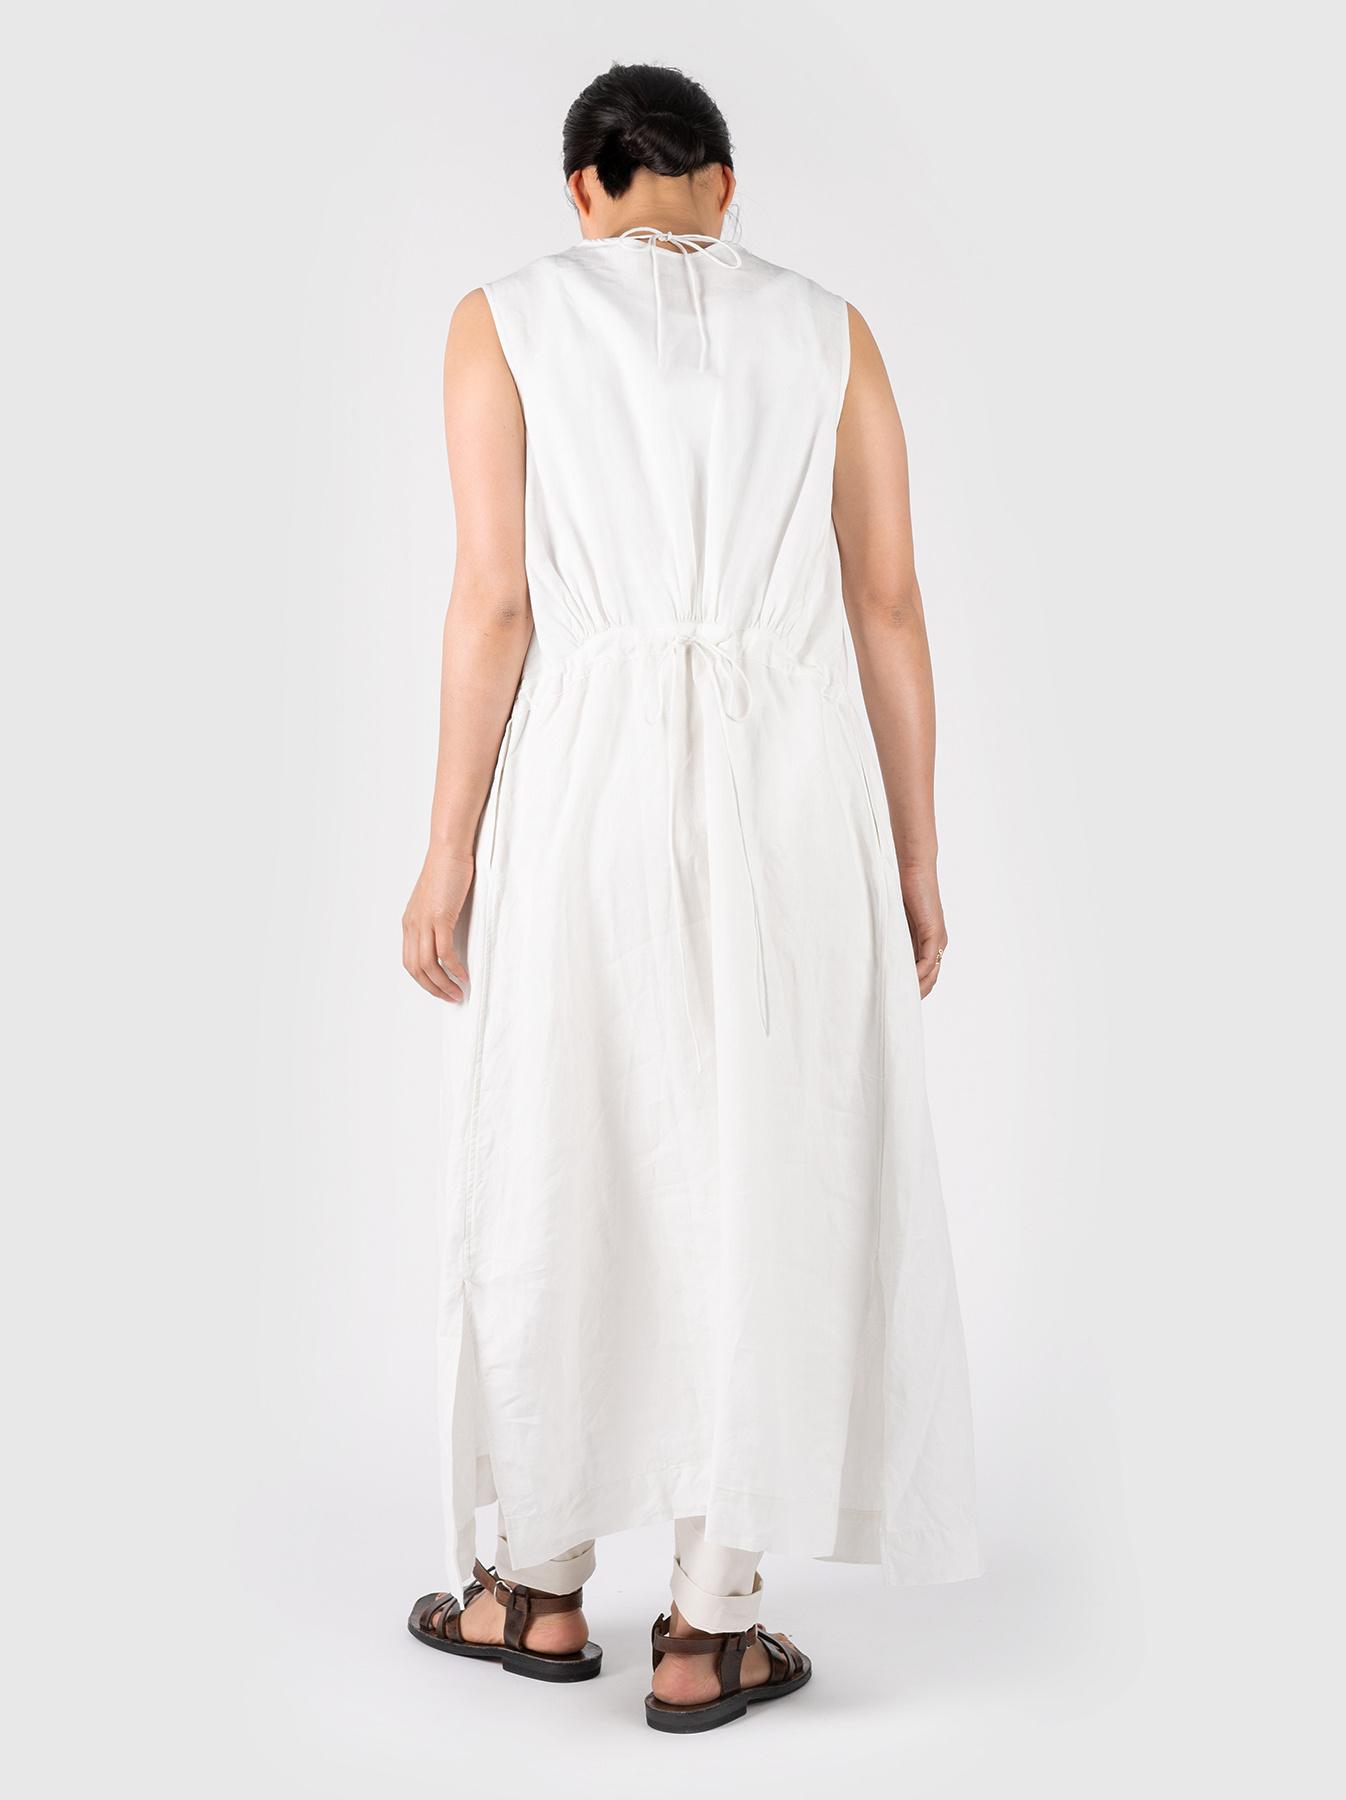 WH Linen Sleeveless Tuck Dress-4